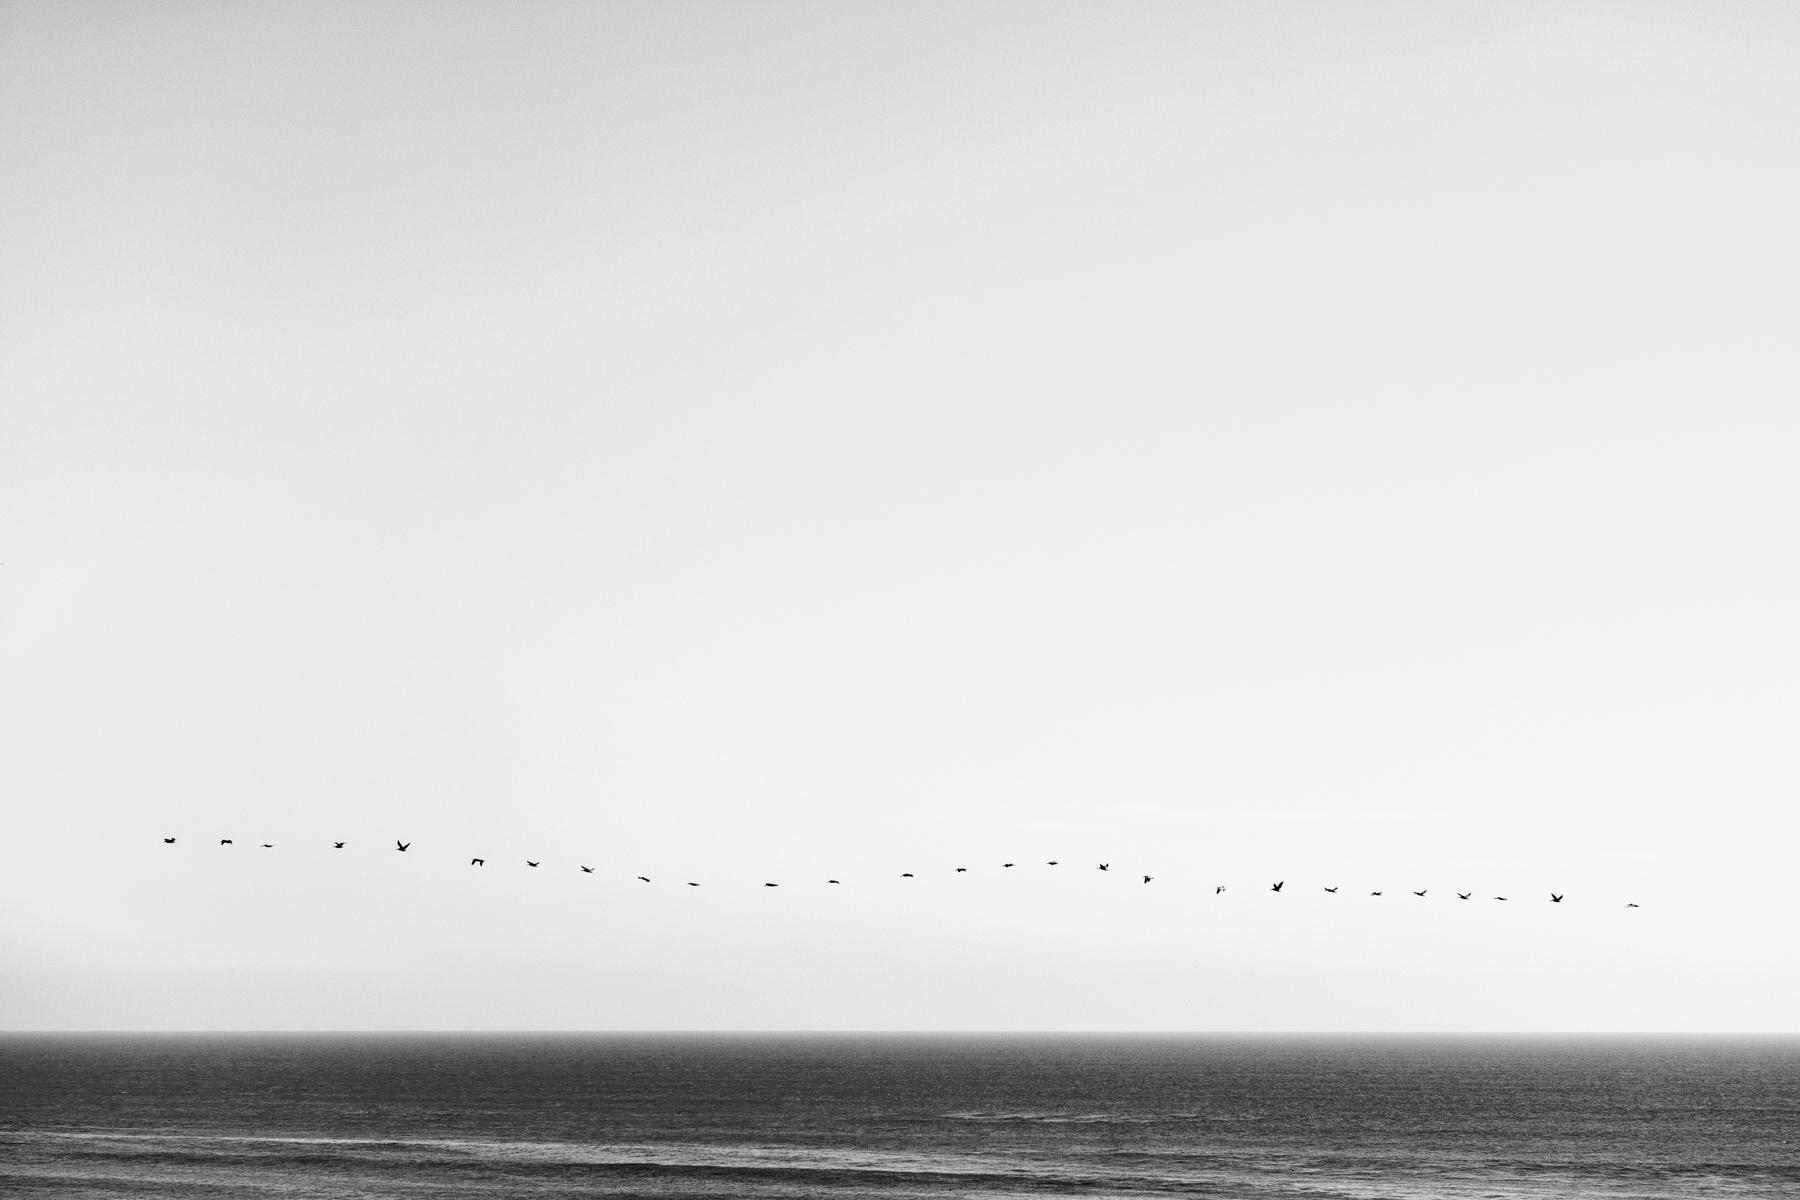 Wasim Muklashy Photography_Realtime Lapse_Samsung NX3000_Malibu_California